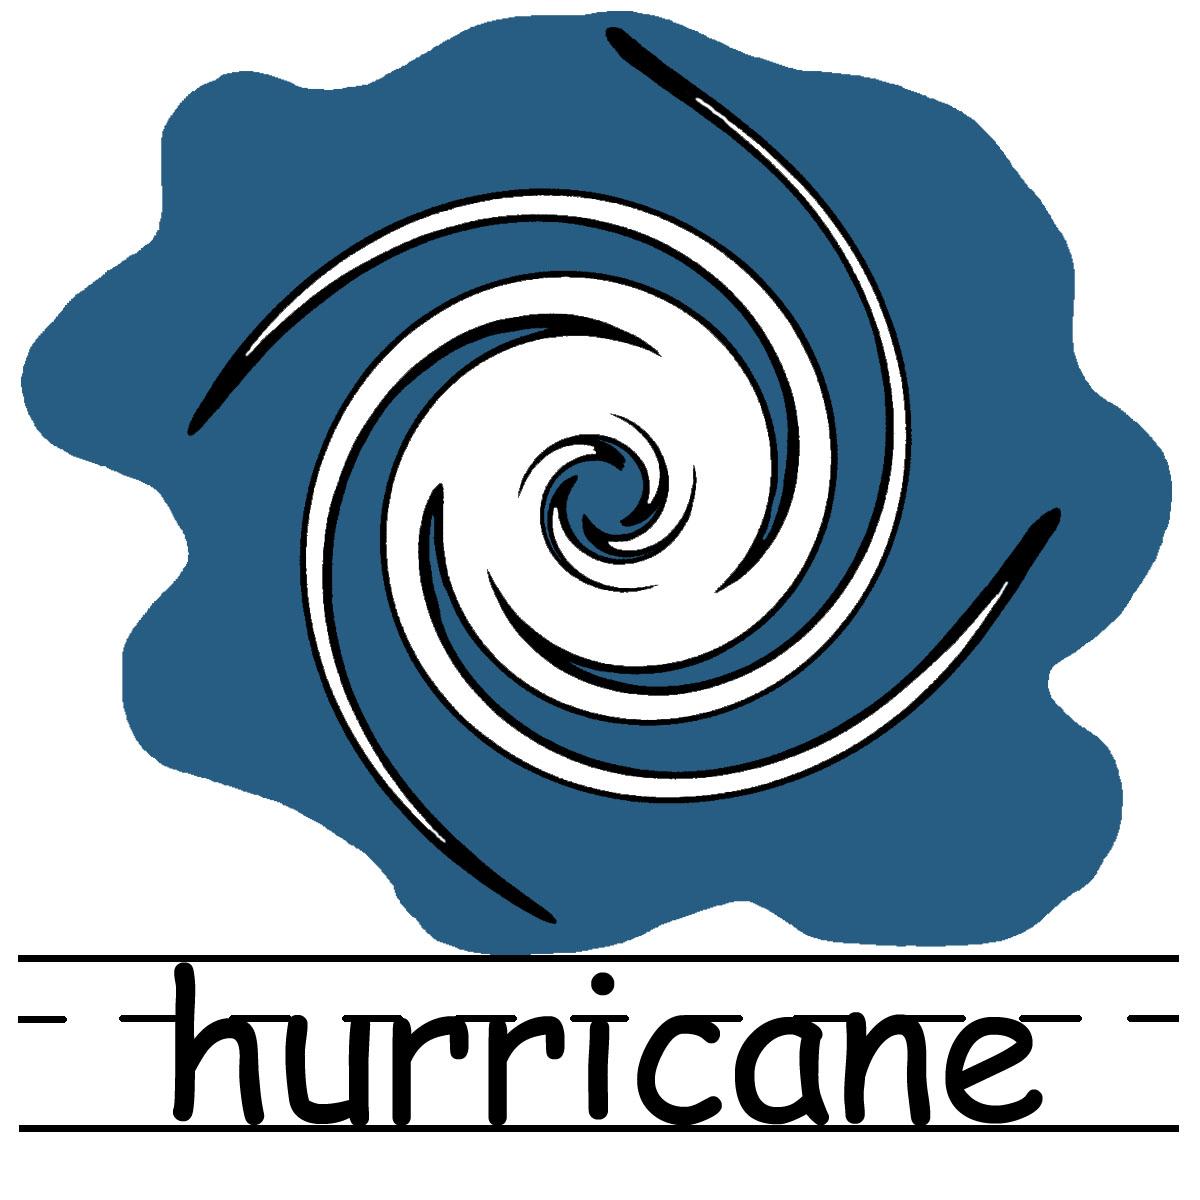 hurricane symbol png